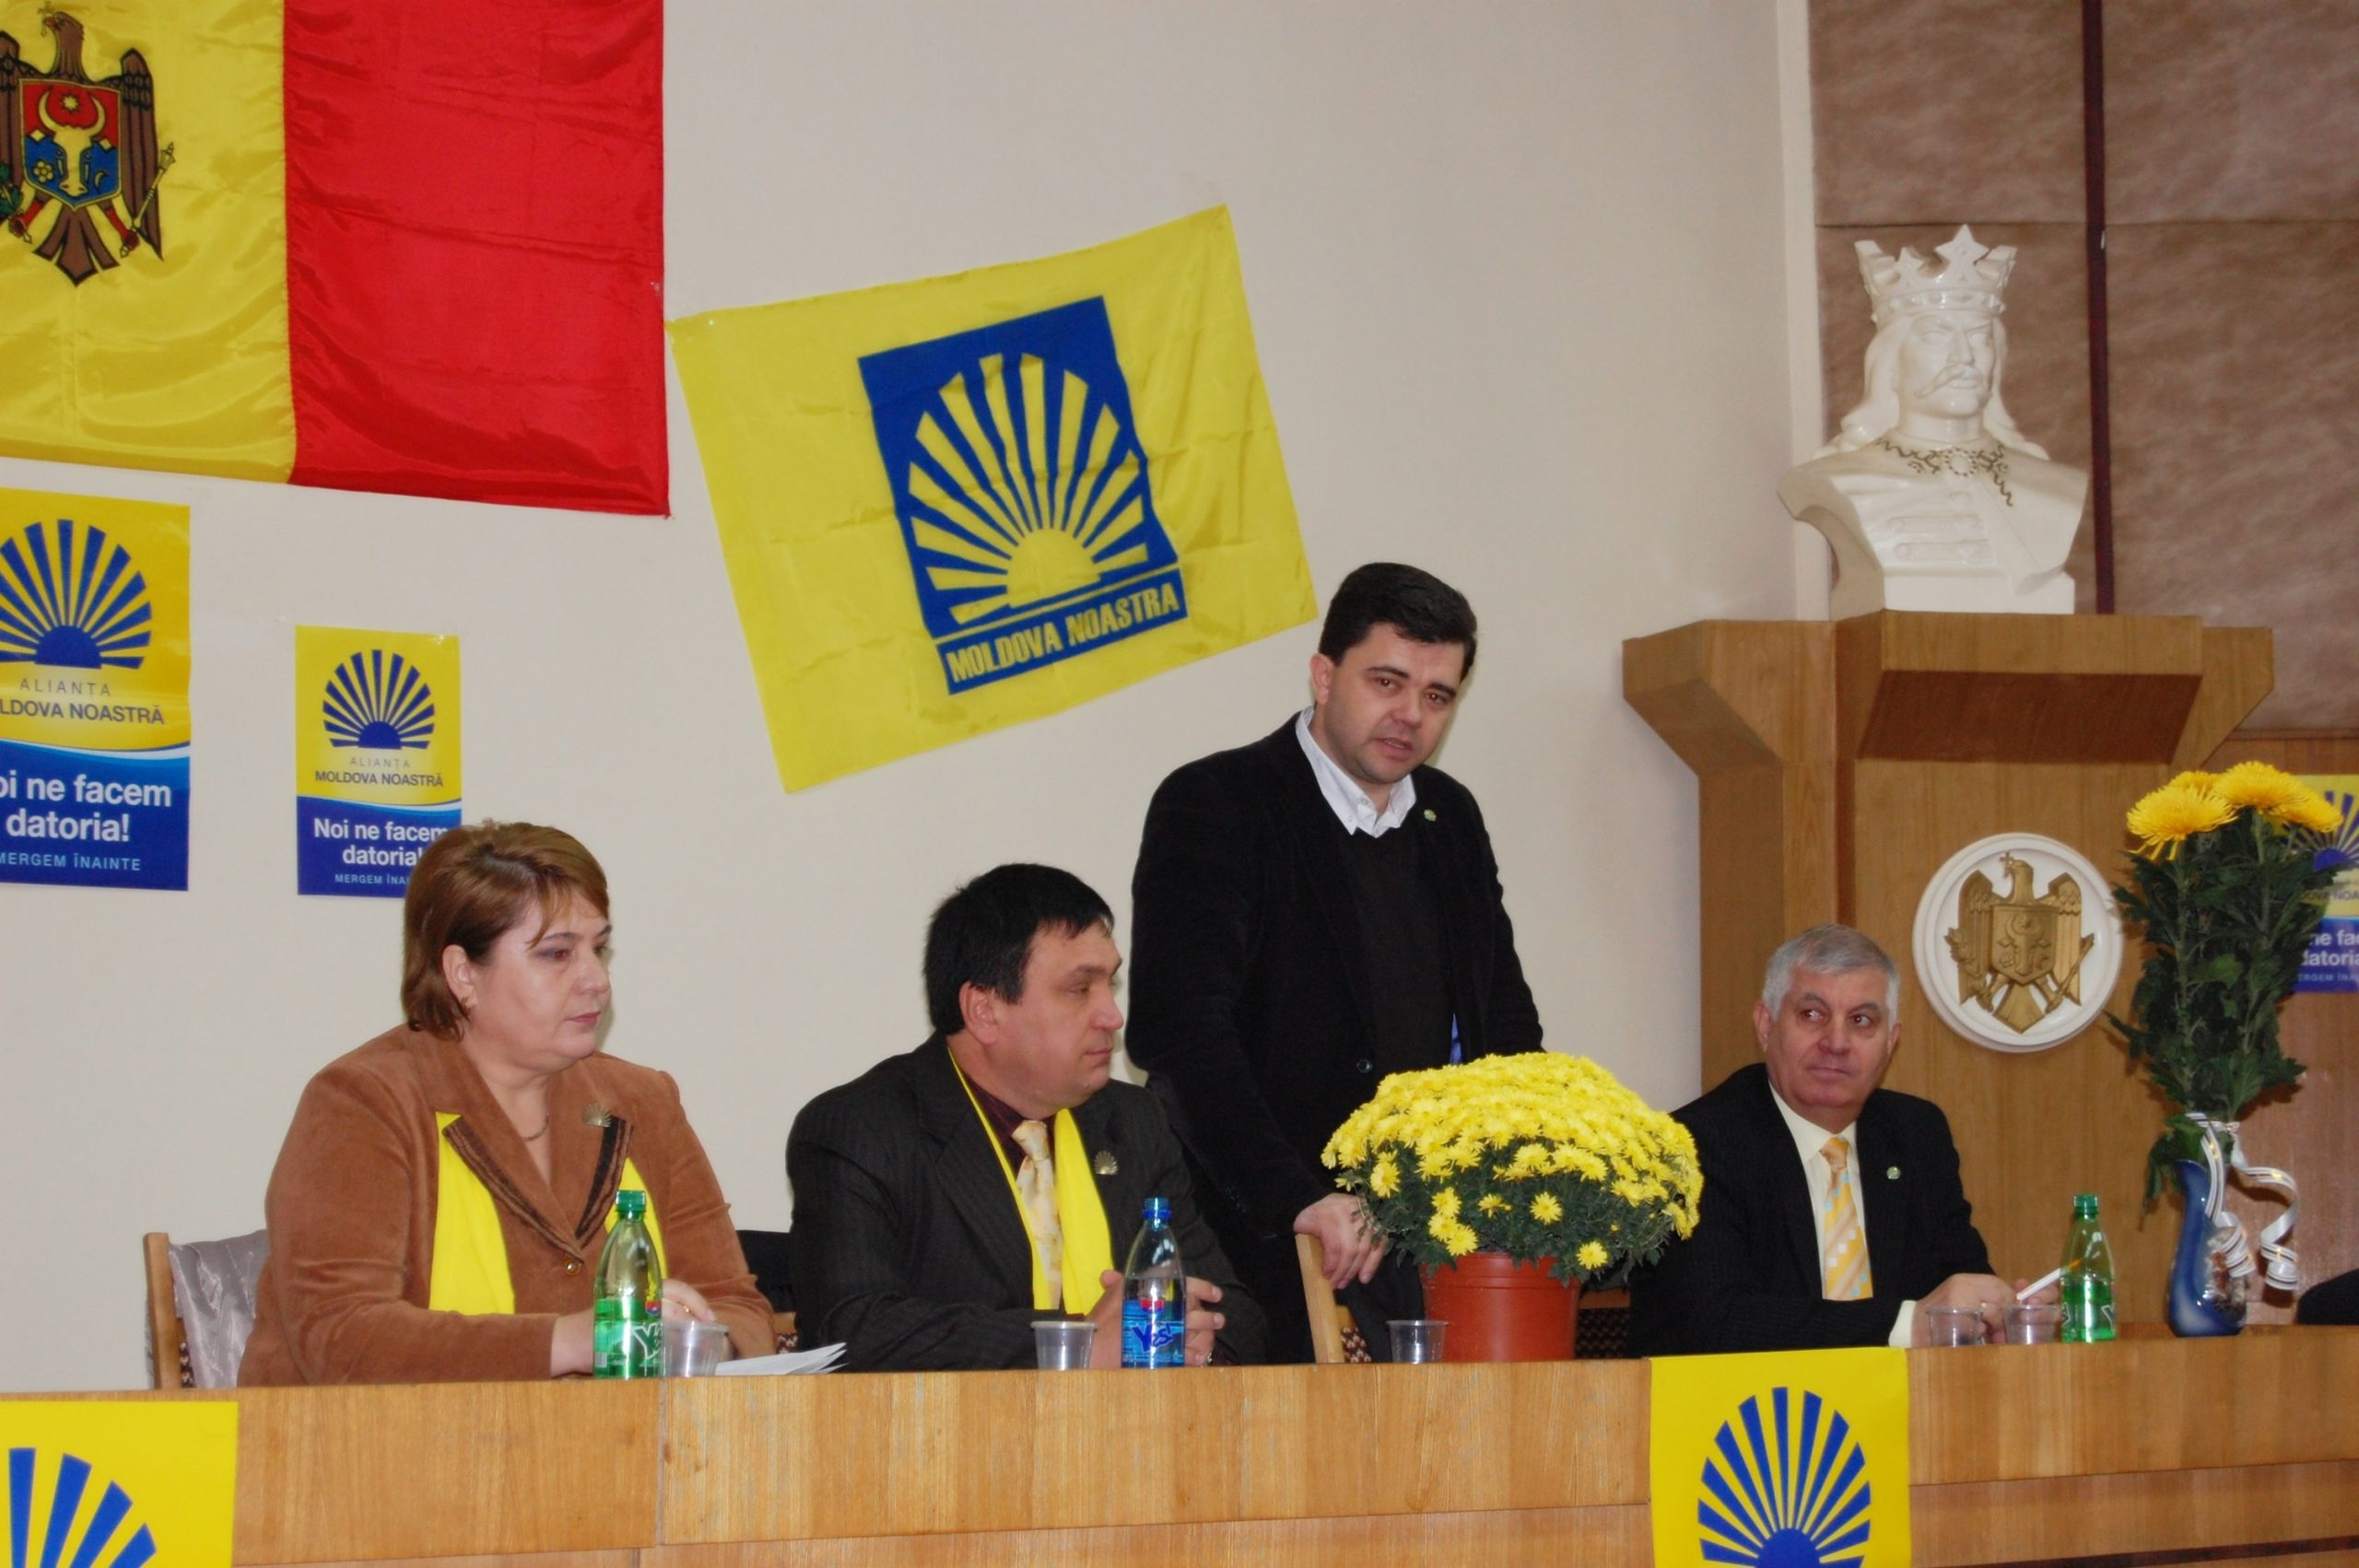 Anul 2010. Conferința AMN la Ungheni. De la stânga la dreapta: Ludmila Guzun, Alexandru Lipcan, Victor Osipov, Ion Harea